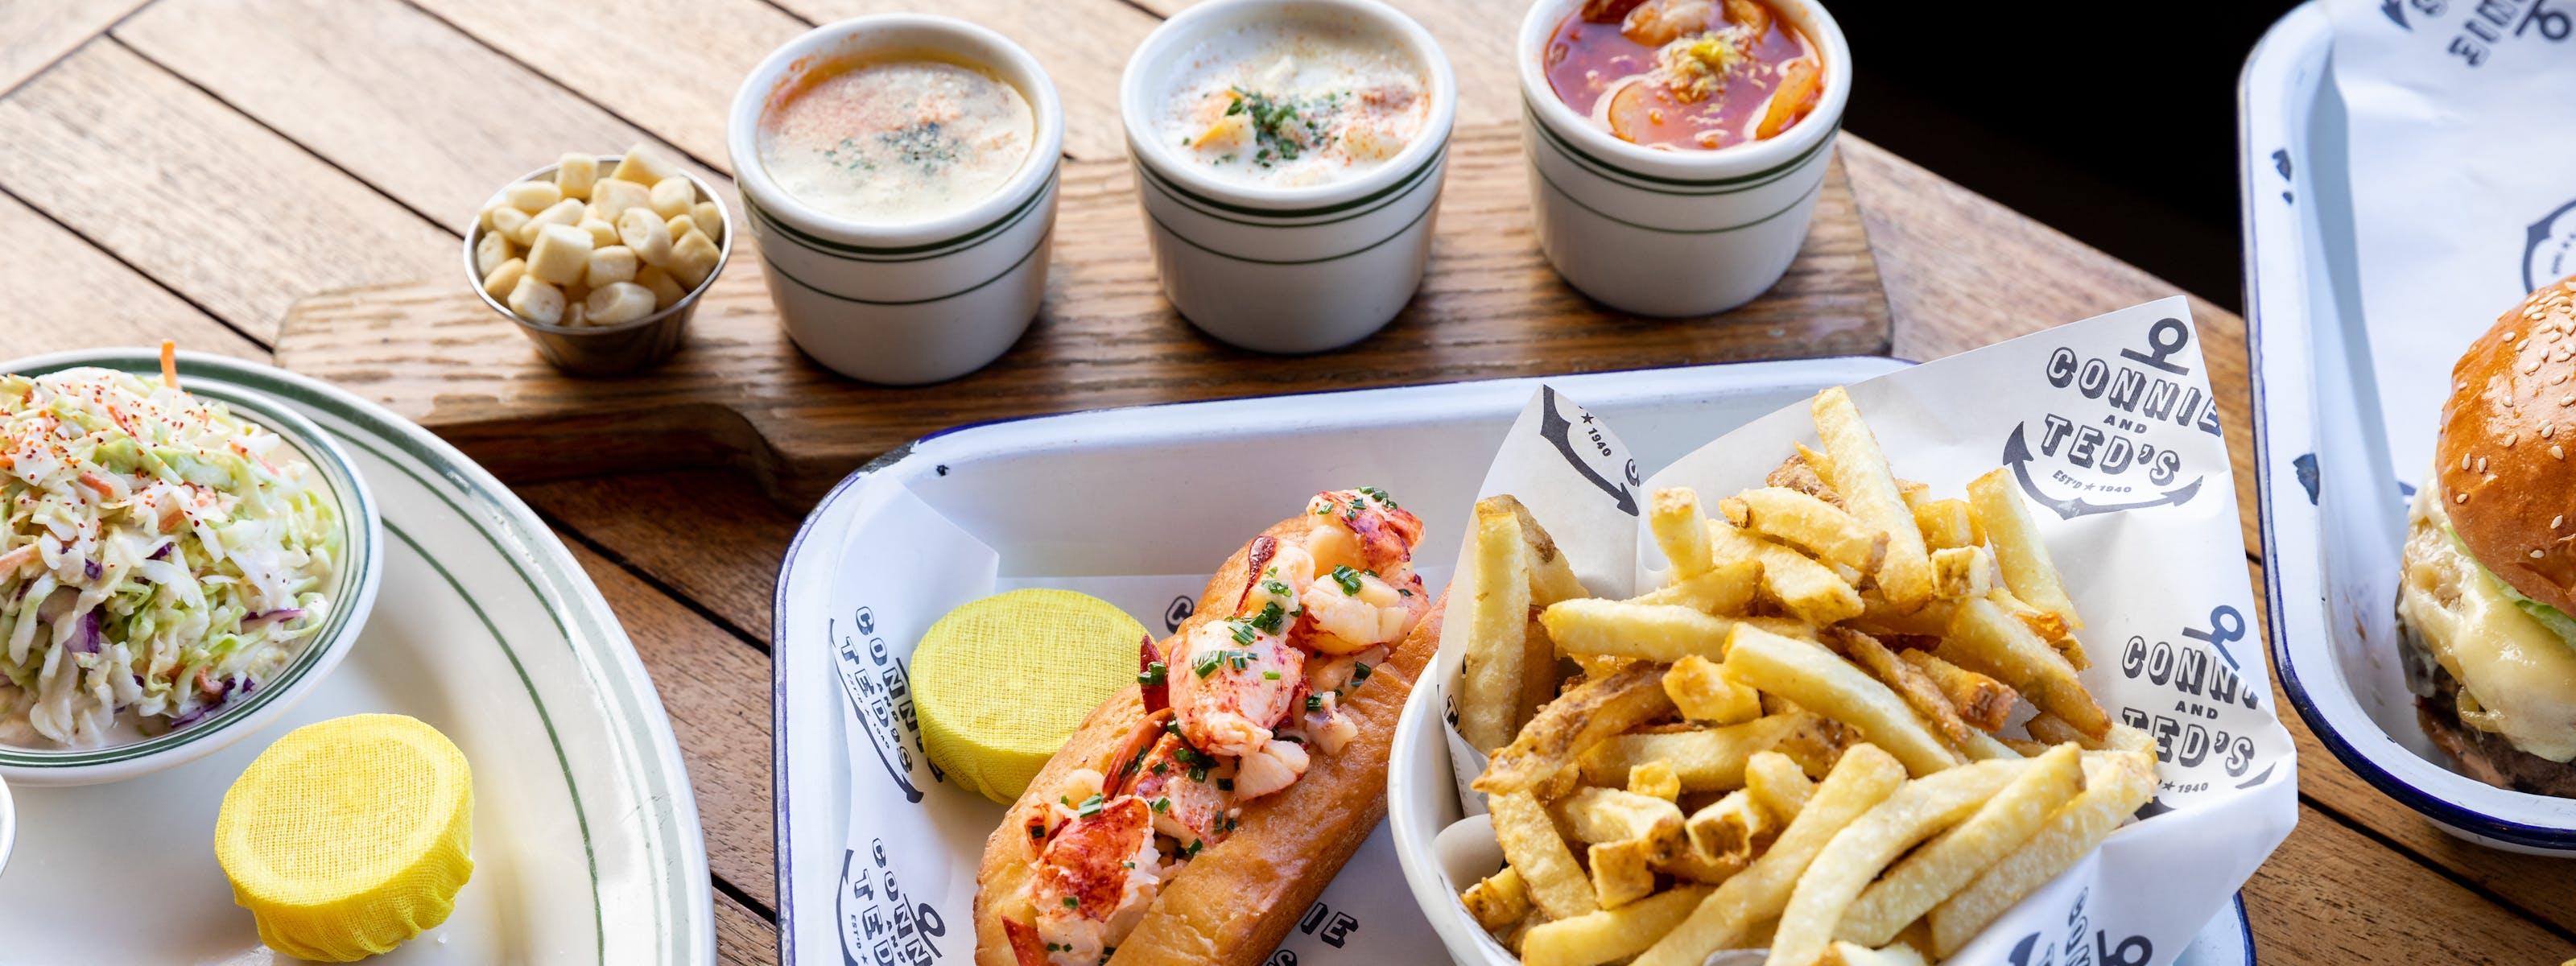 Infatuation Staff Writer Brett Keating's 5 Favorite LA Restaurants Right now - Los Angeles - The Infatuation